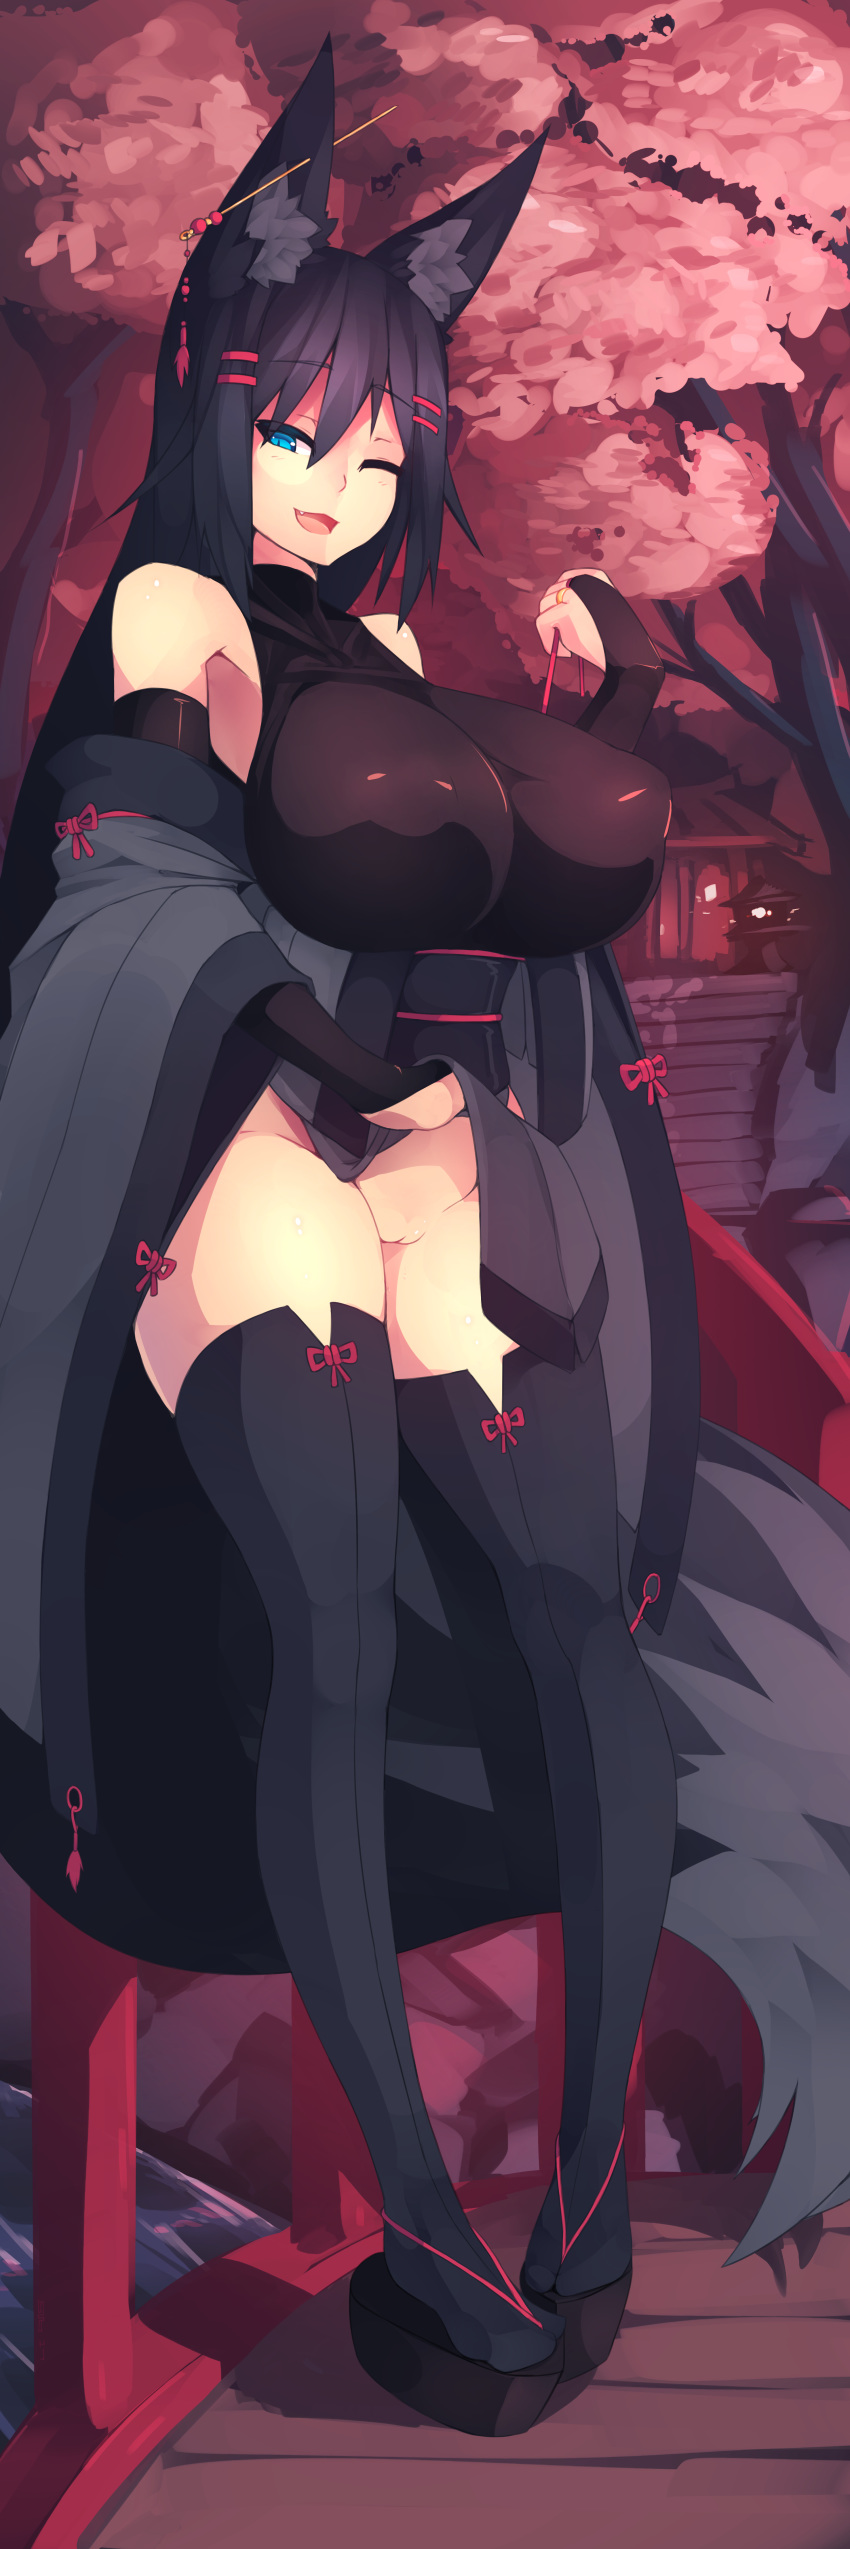 hentai end re;quest death Sonya blade mk vs dc